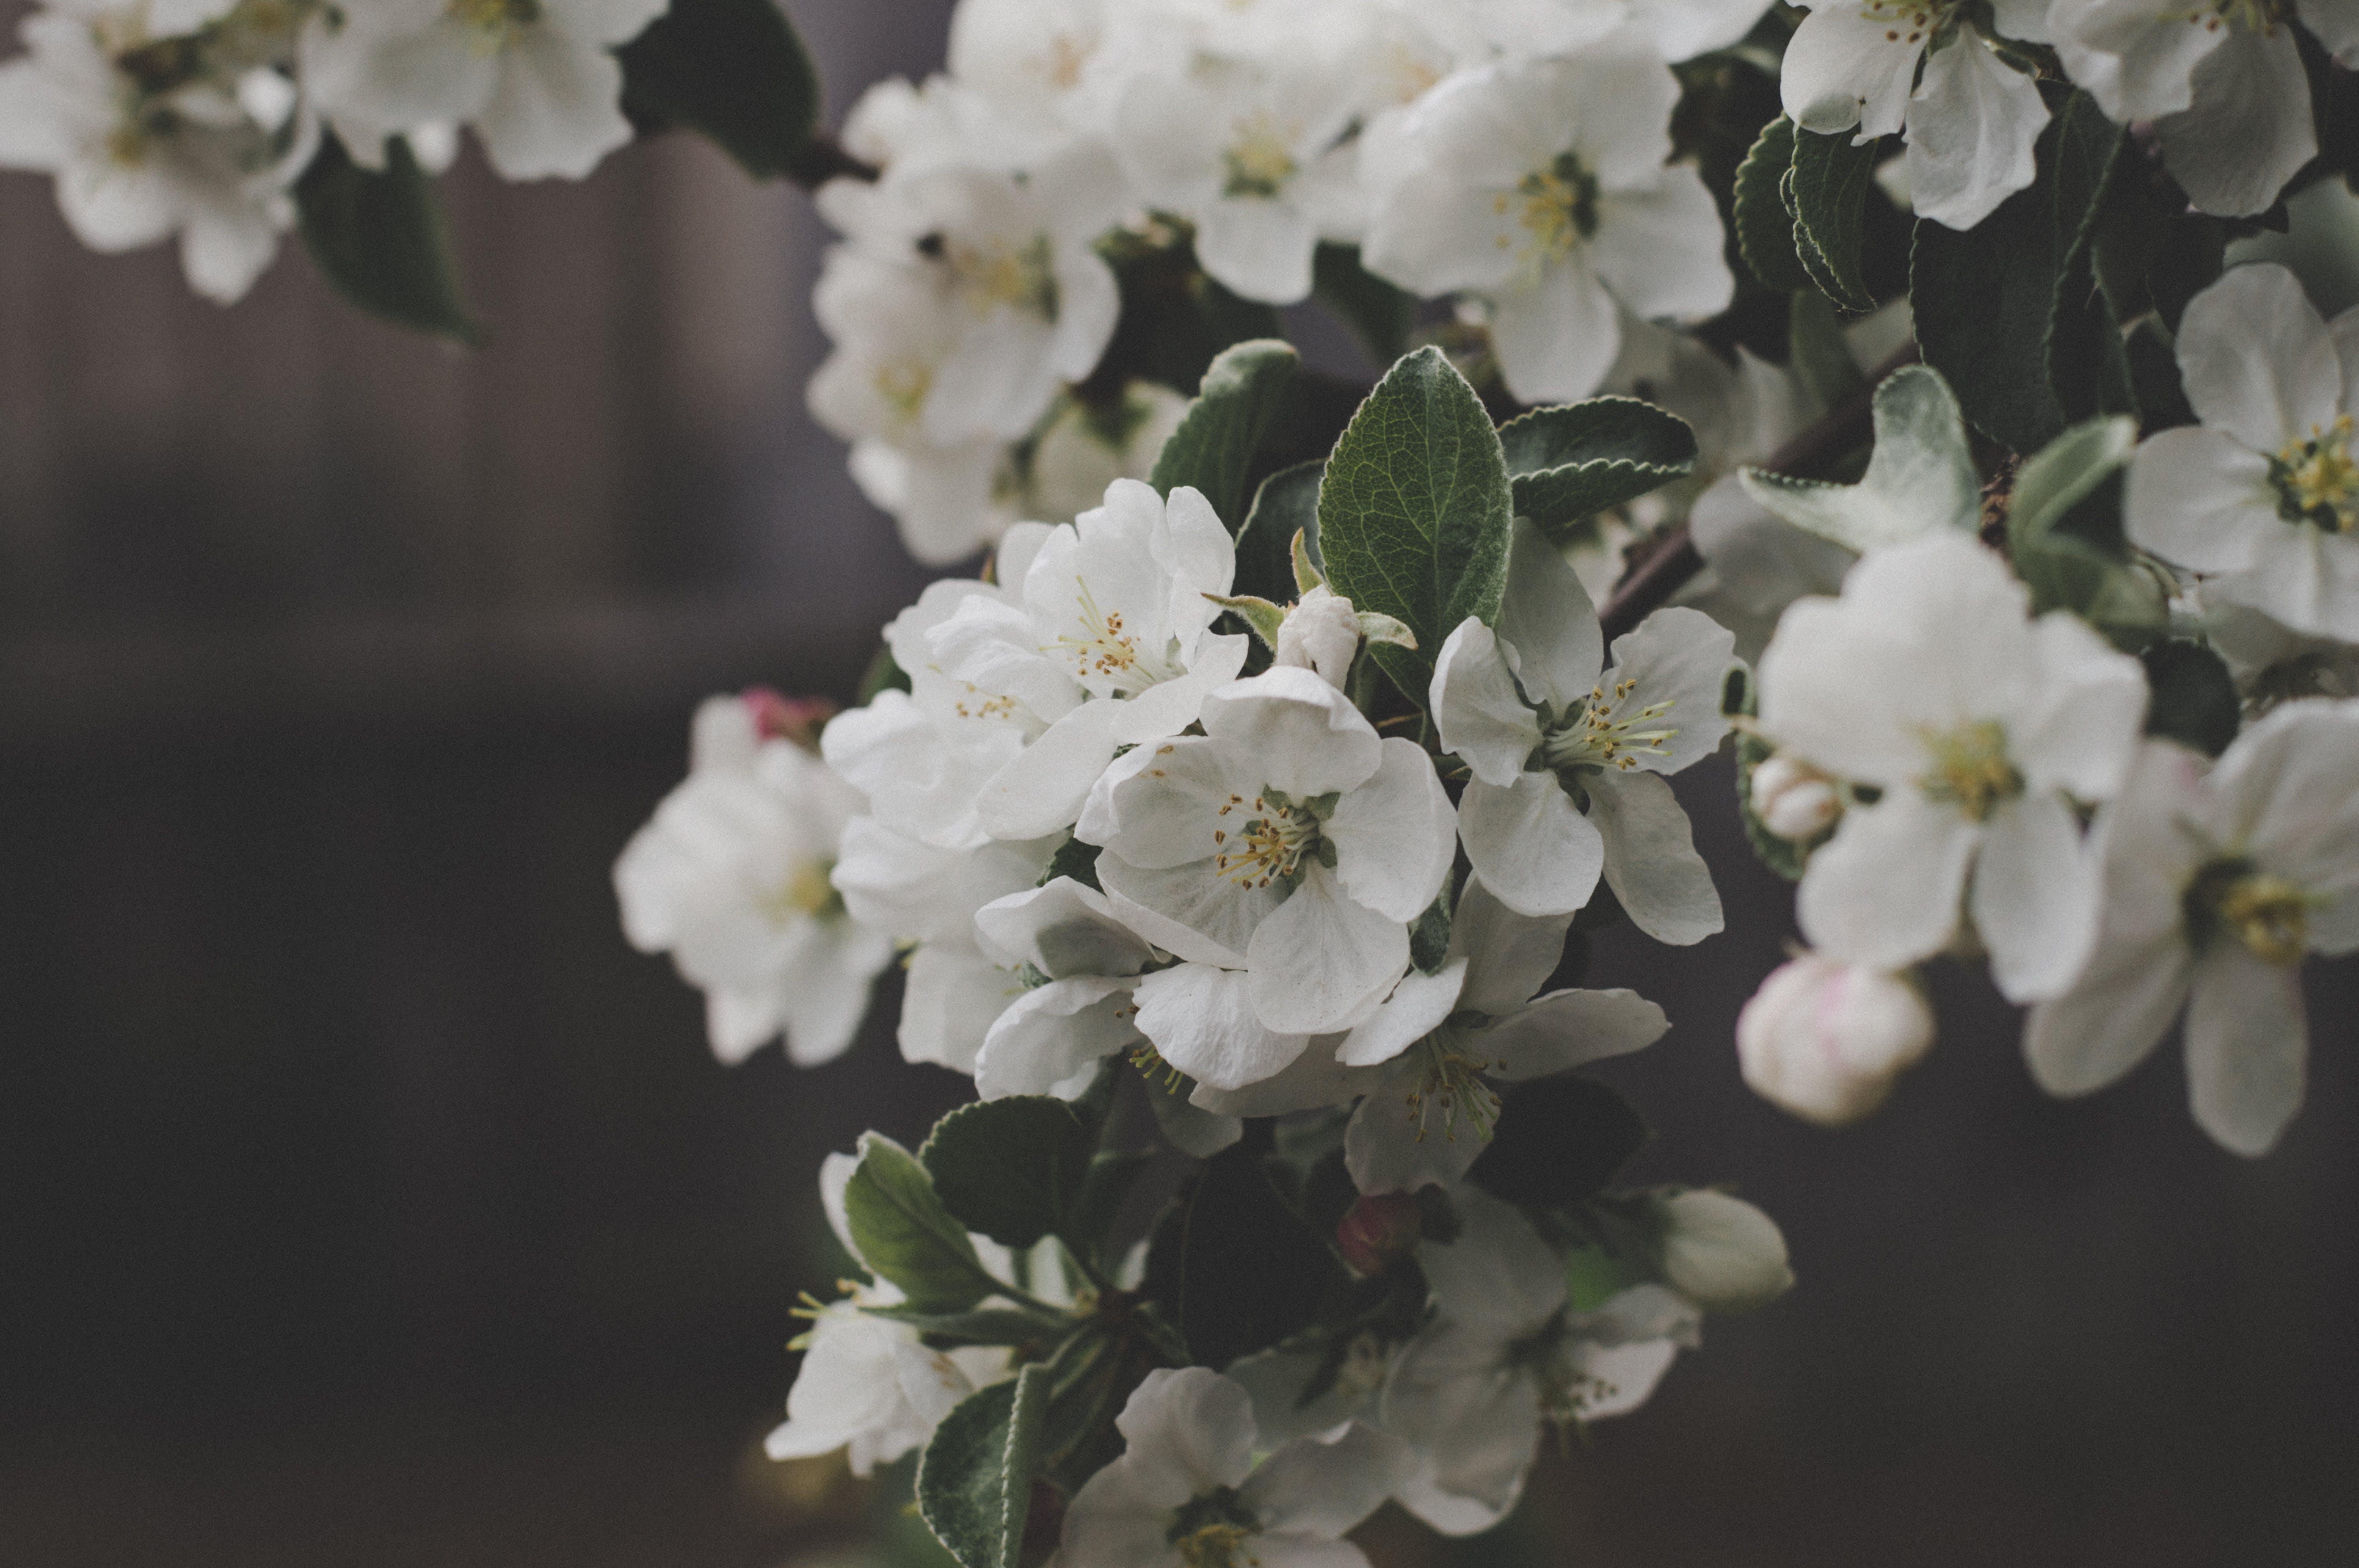 blätter, blühen, blumen